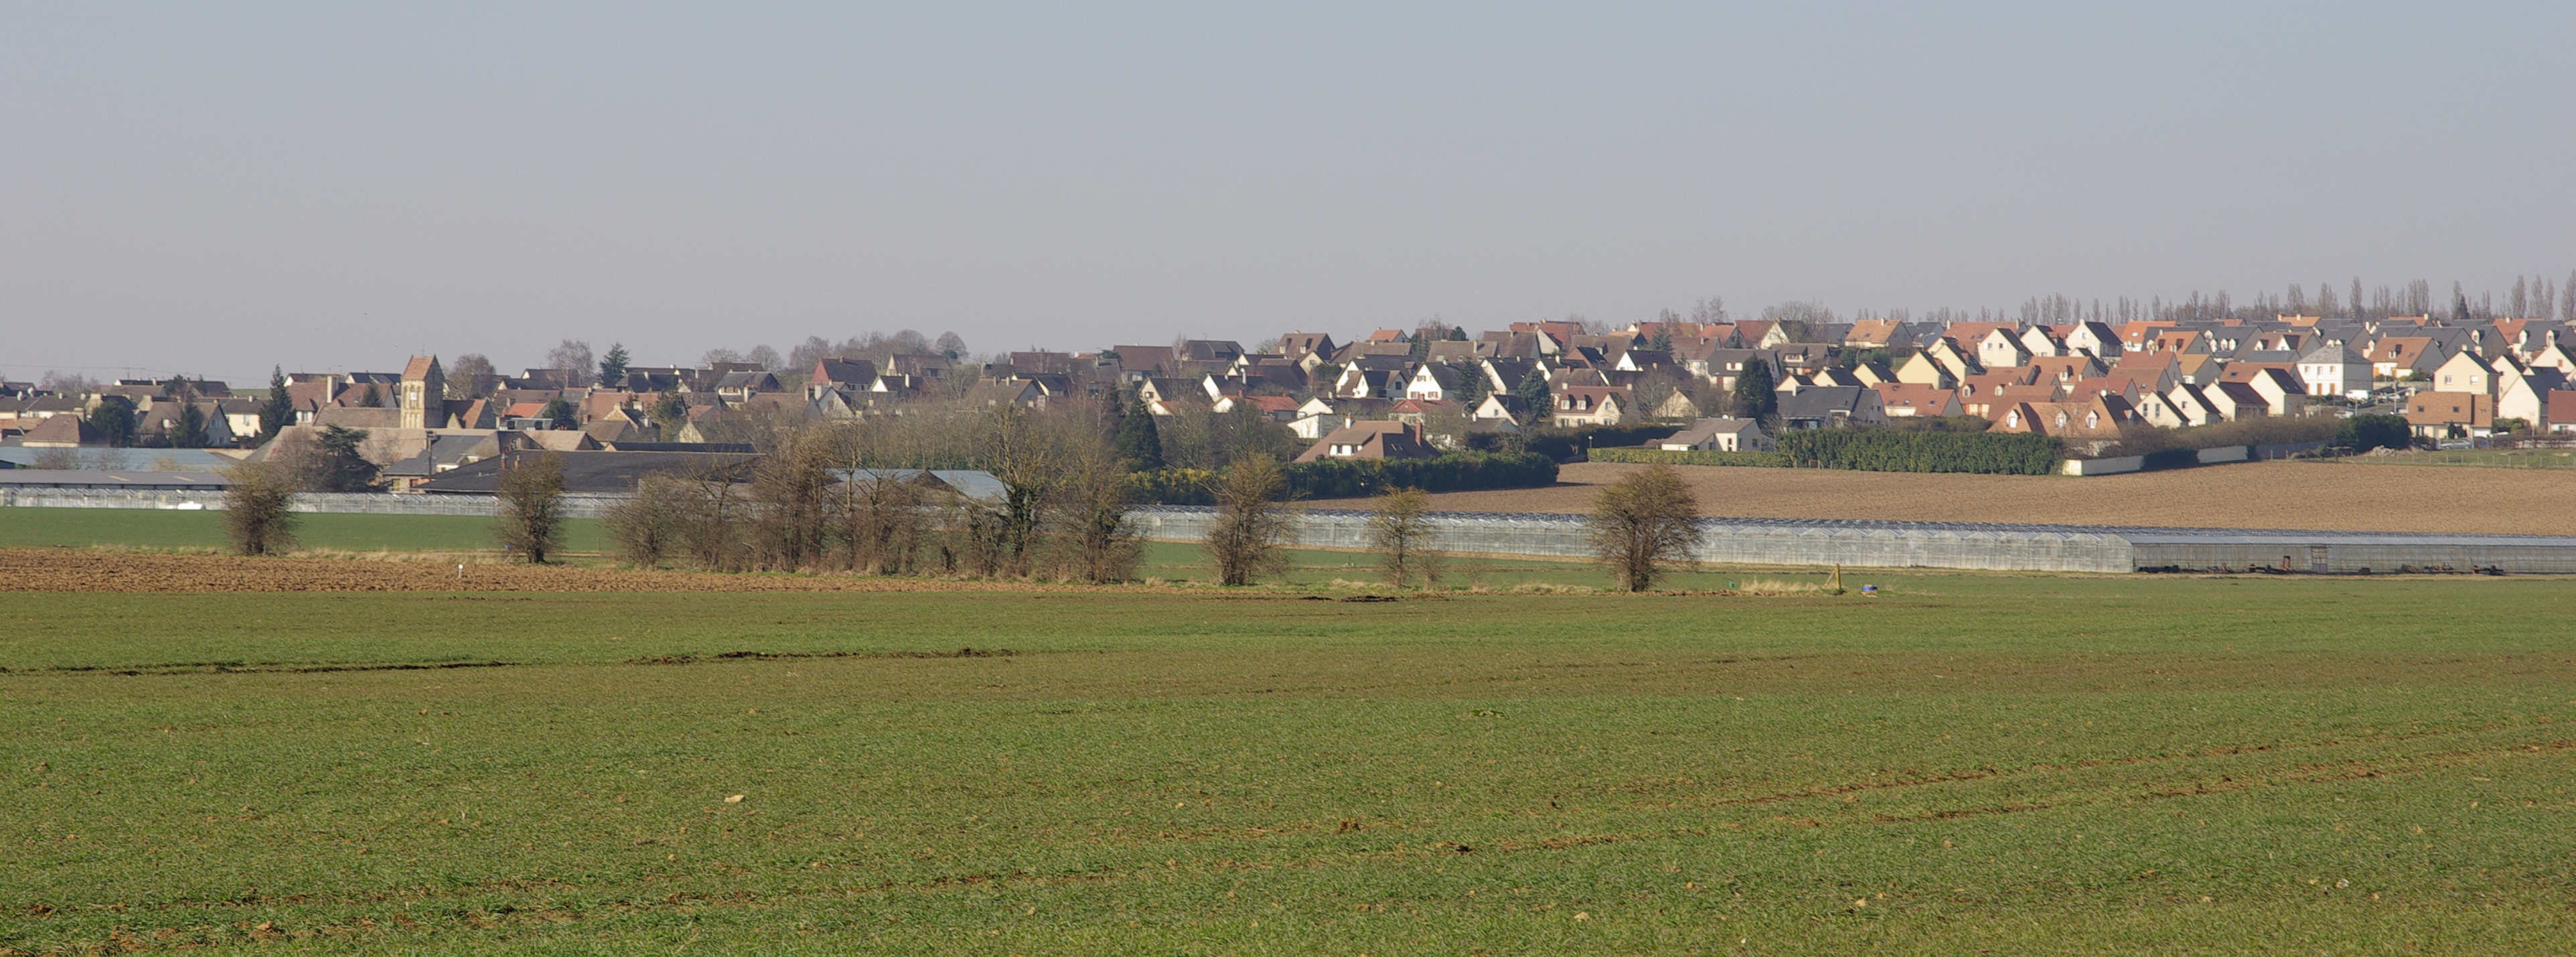 Fontenay-le-Marmion